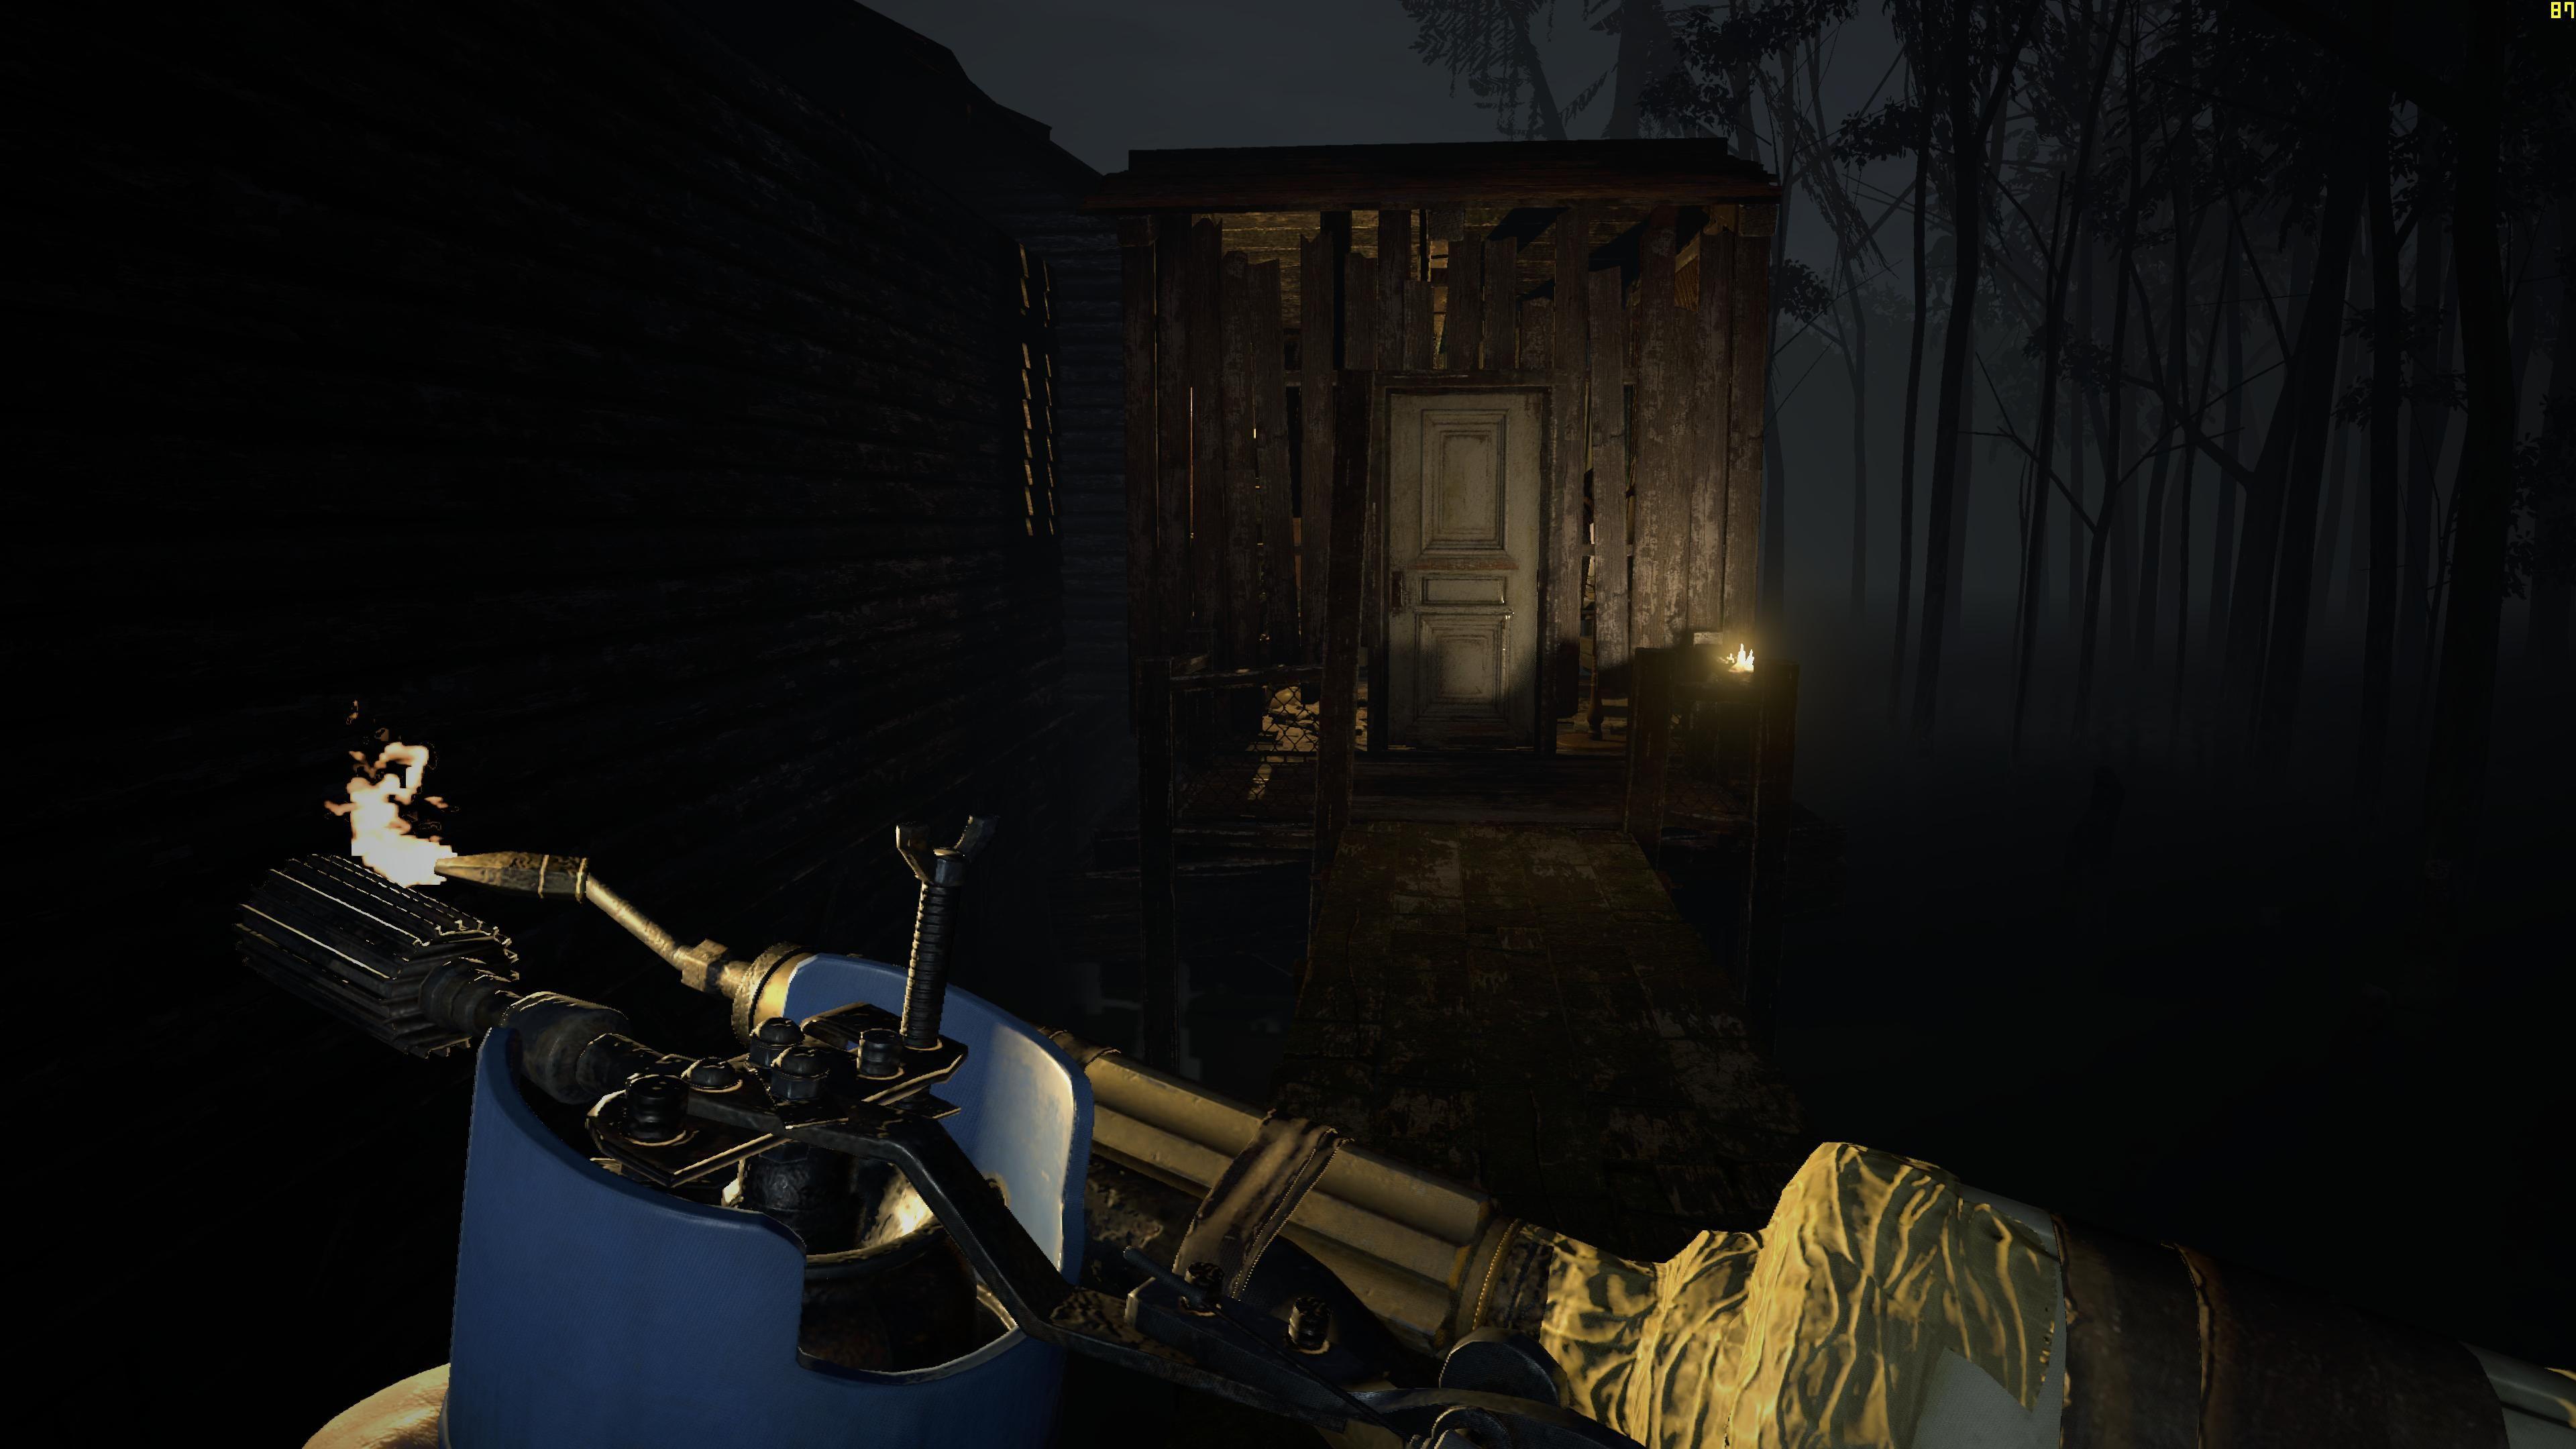 Resident Evil 7 Biohazard How To Gain FPS